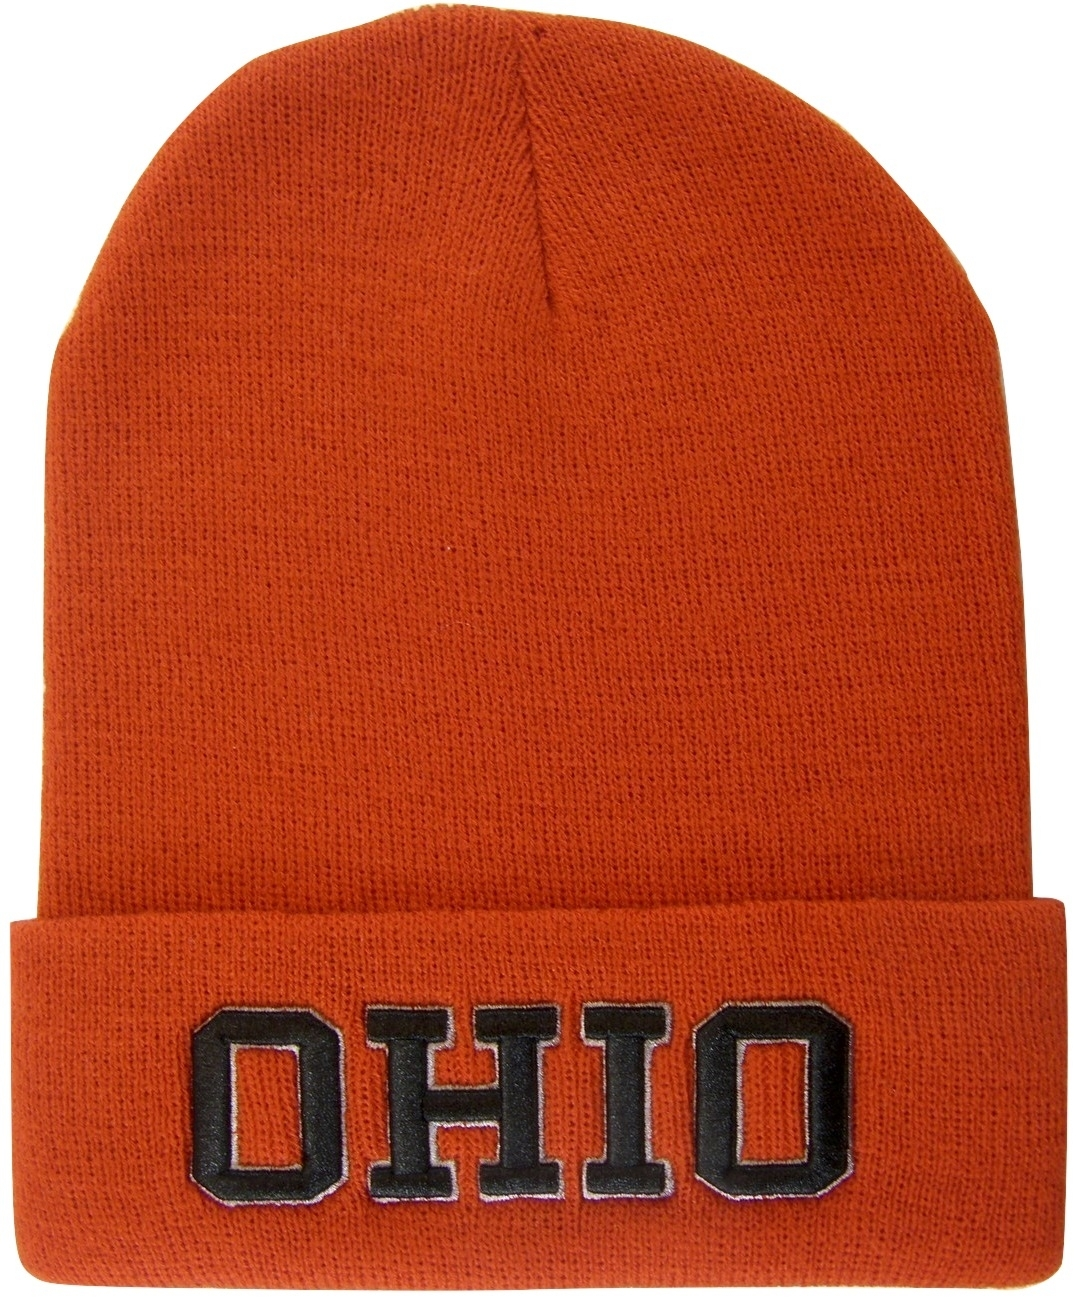 BVE Sports Novelties Ohio Adult Size Winter Knit Beanie Hats